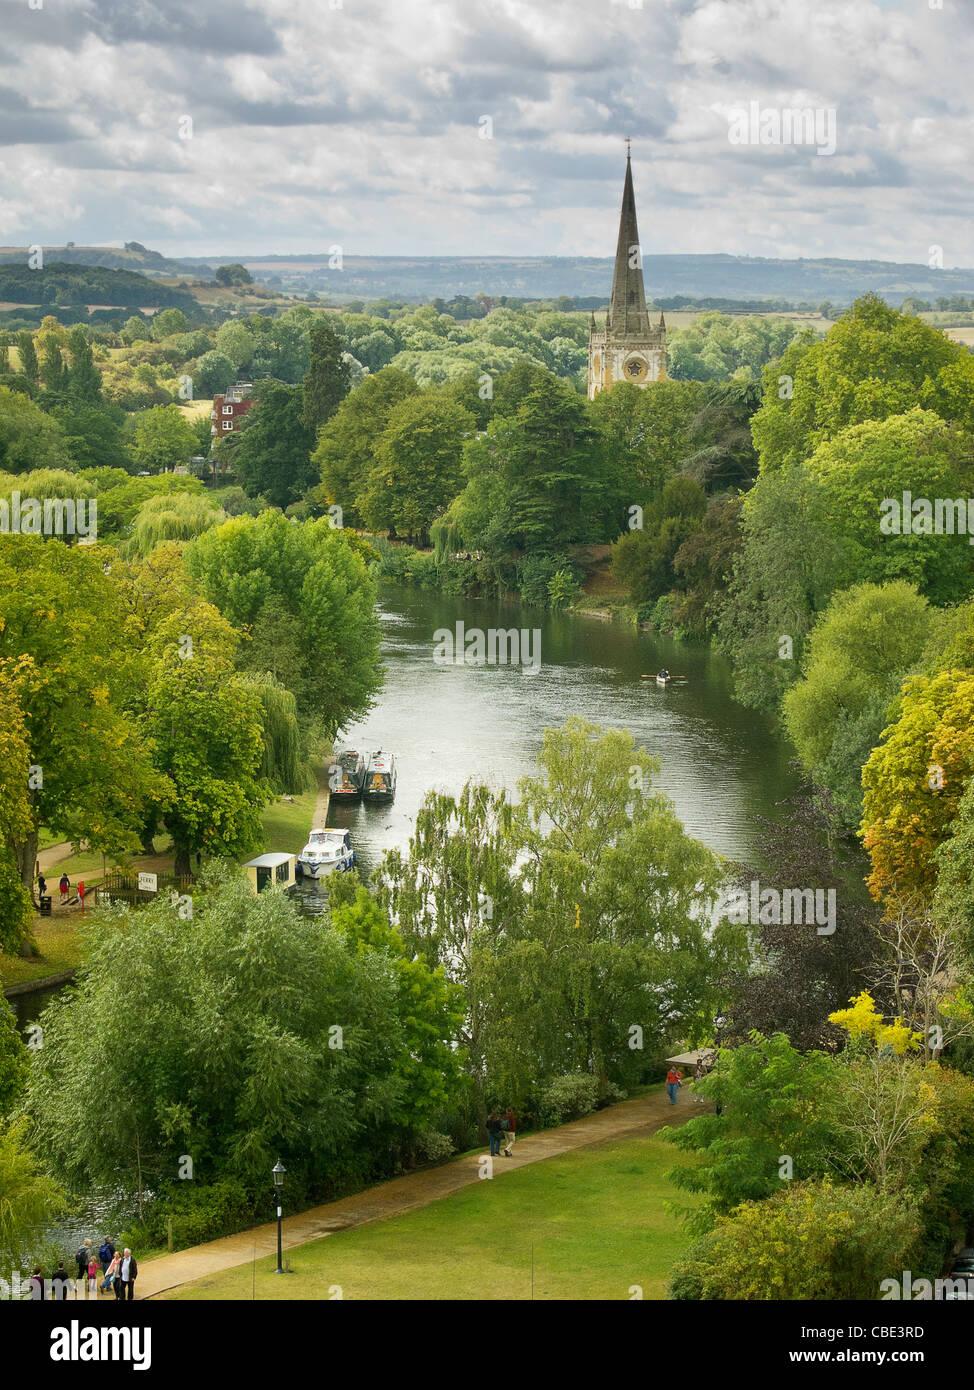 Holy Trinity Church and River Avon, Stratford-upon-Avon - Stock Image